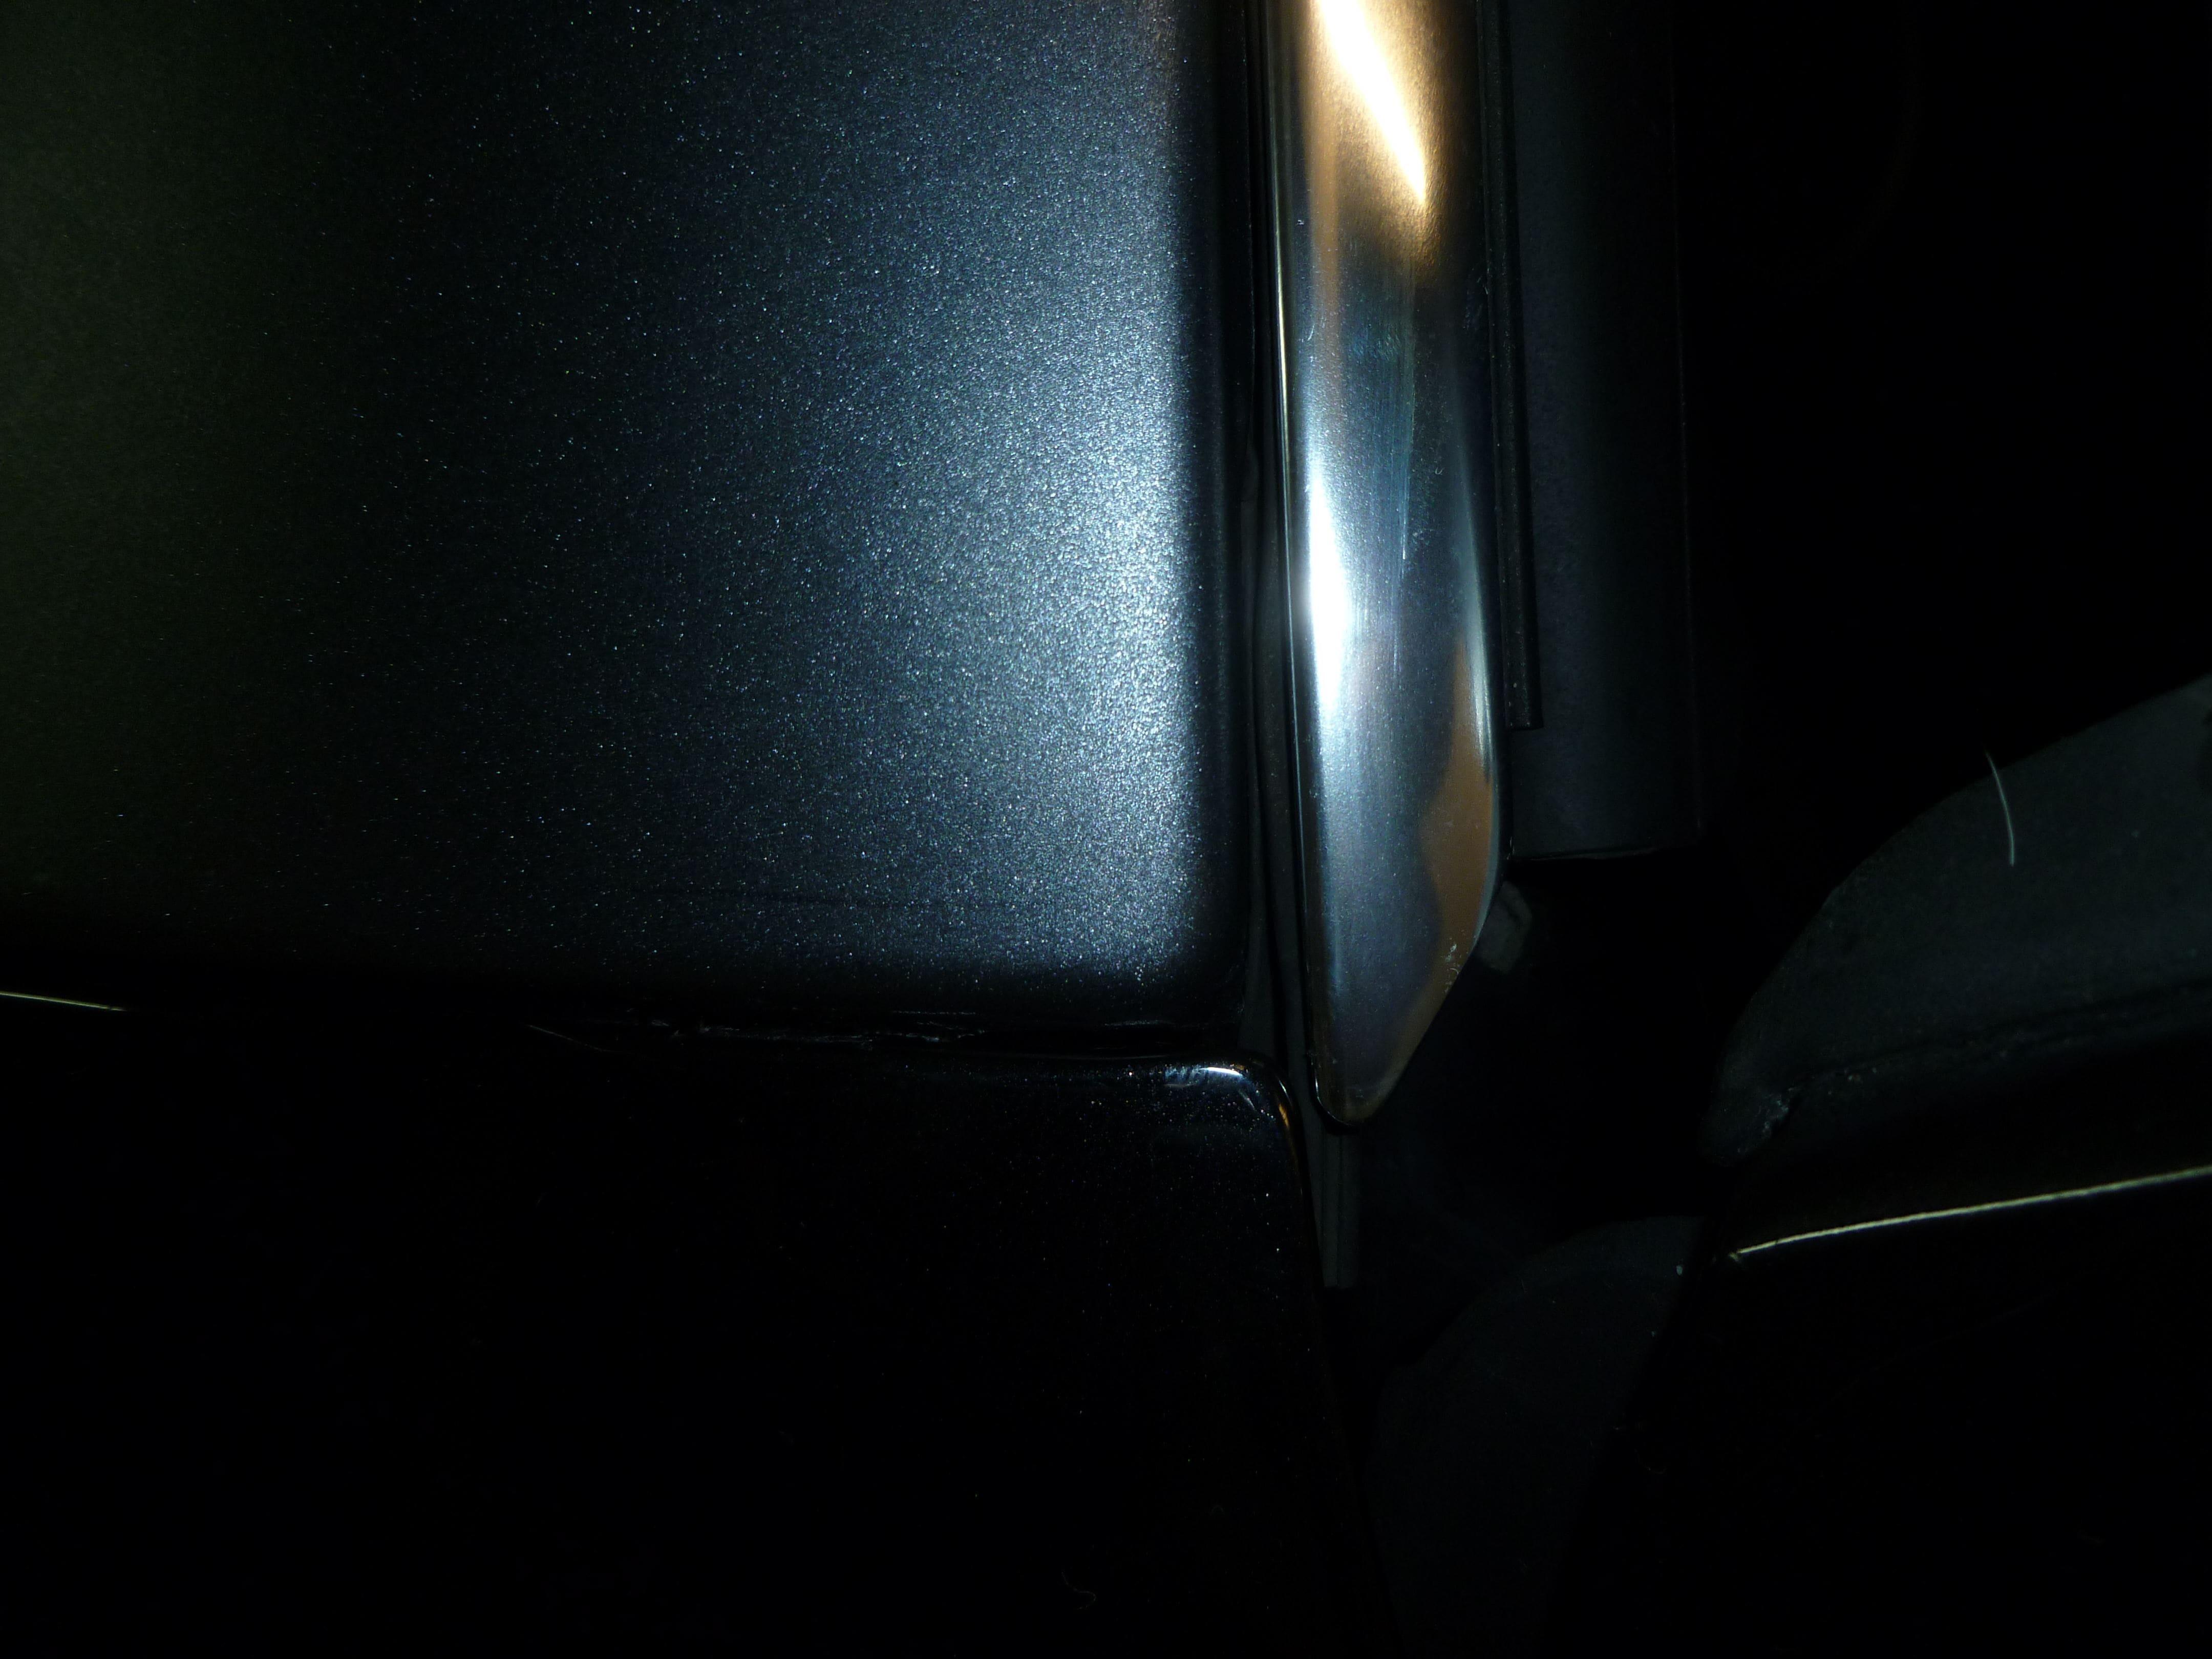 Maserati Gran Turismo met Mat Zwarte Wrap, Carwrapping door Wrapmyride.nu Foto-nr:6046, ©2020